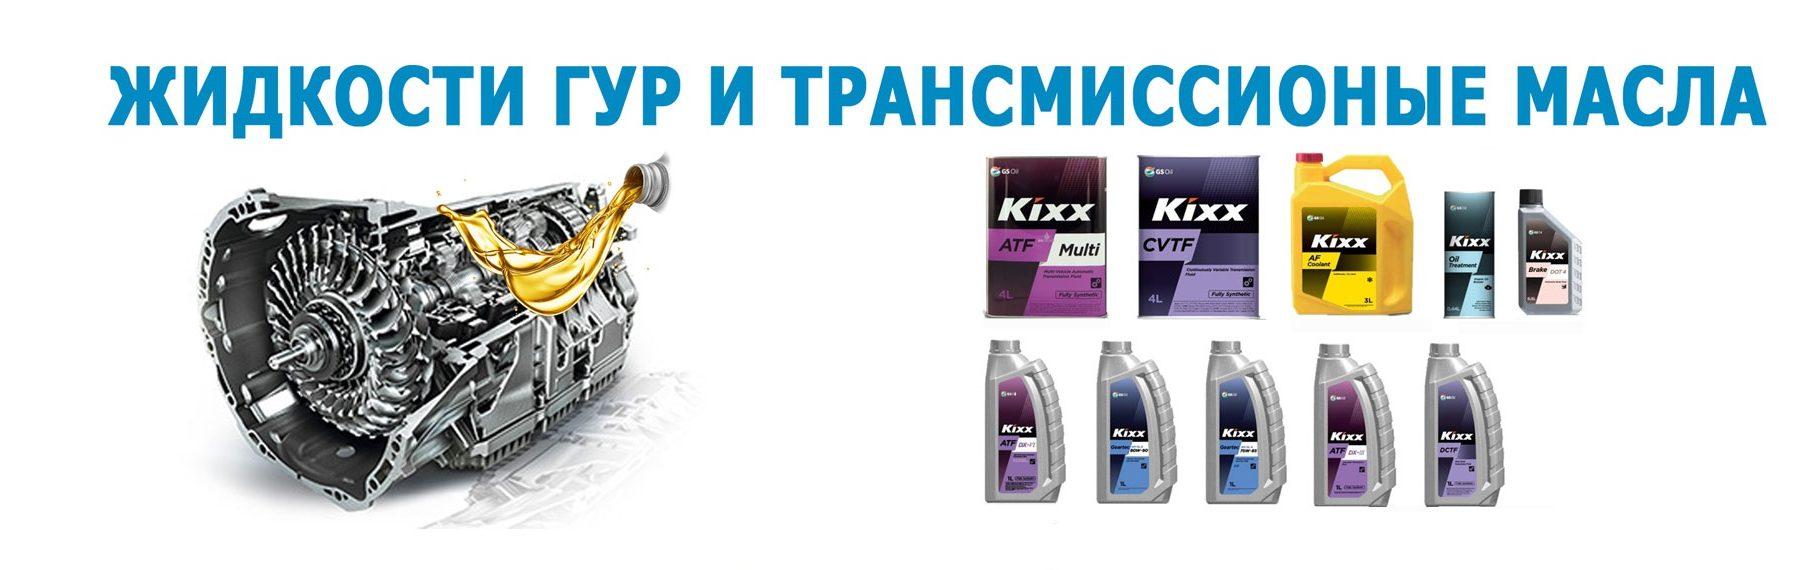 Купить Kixx